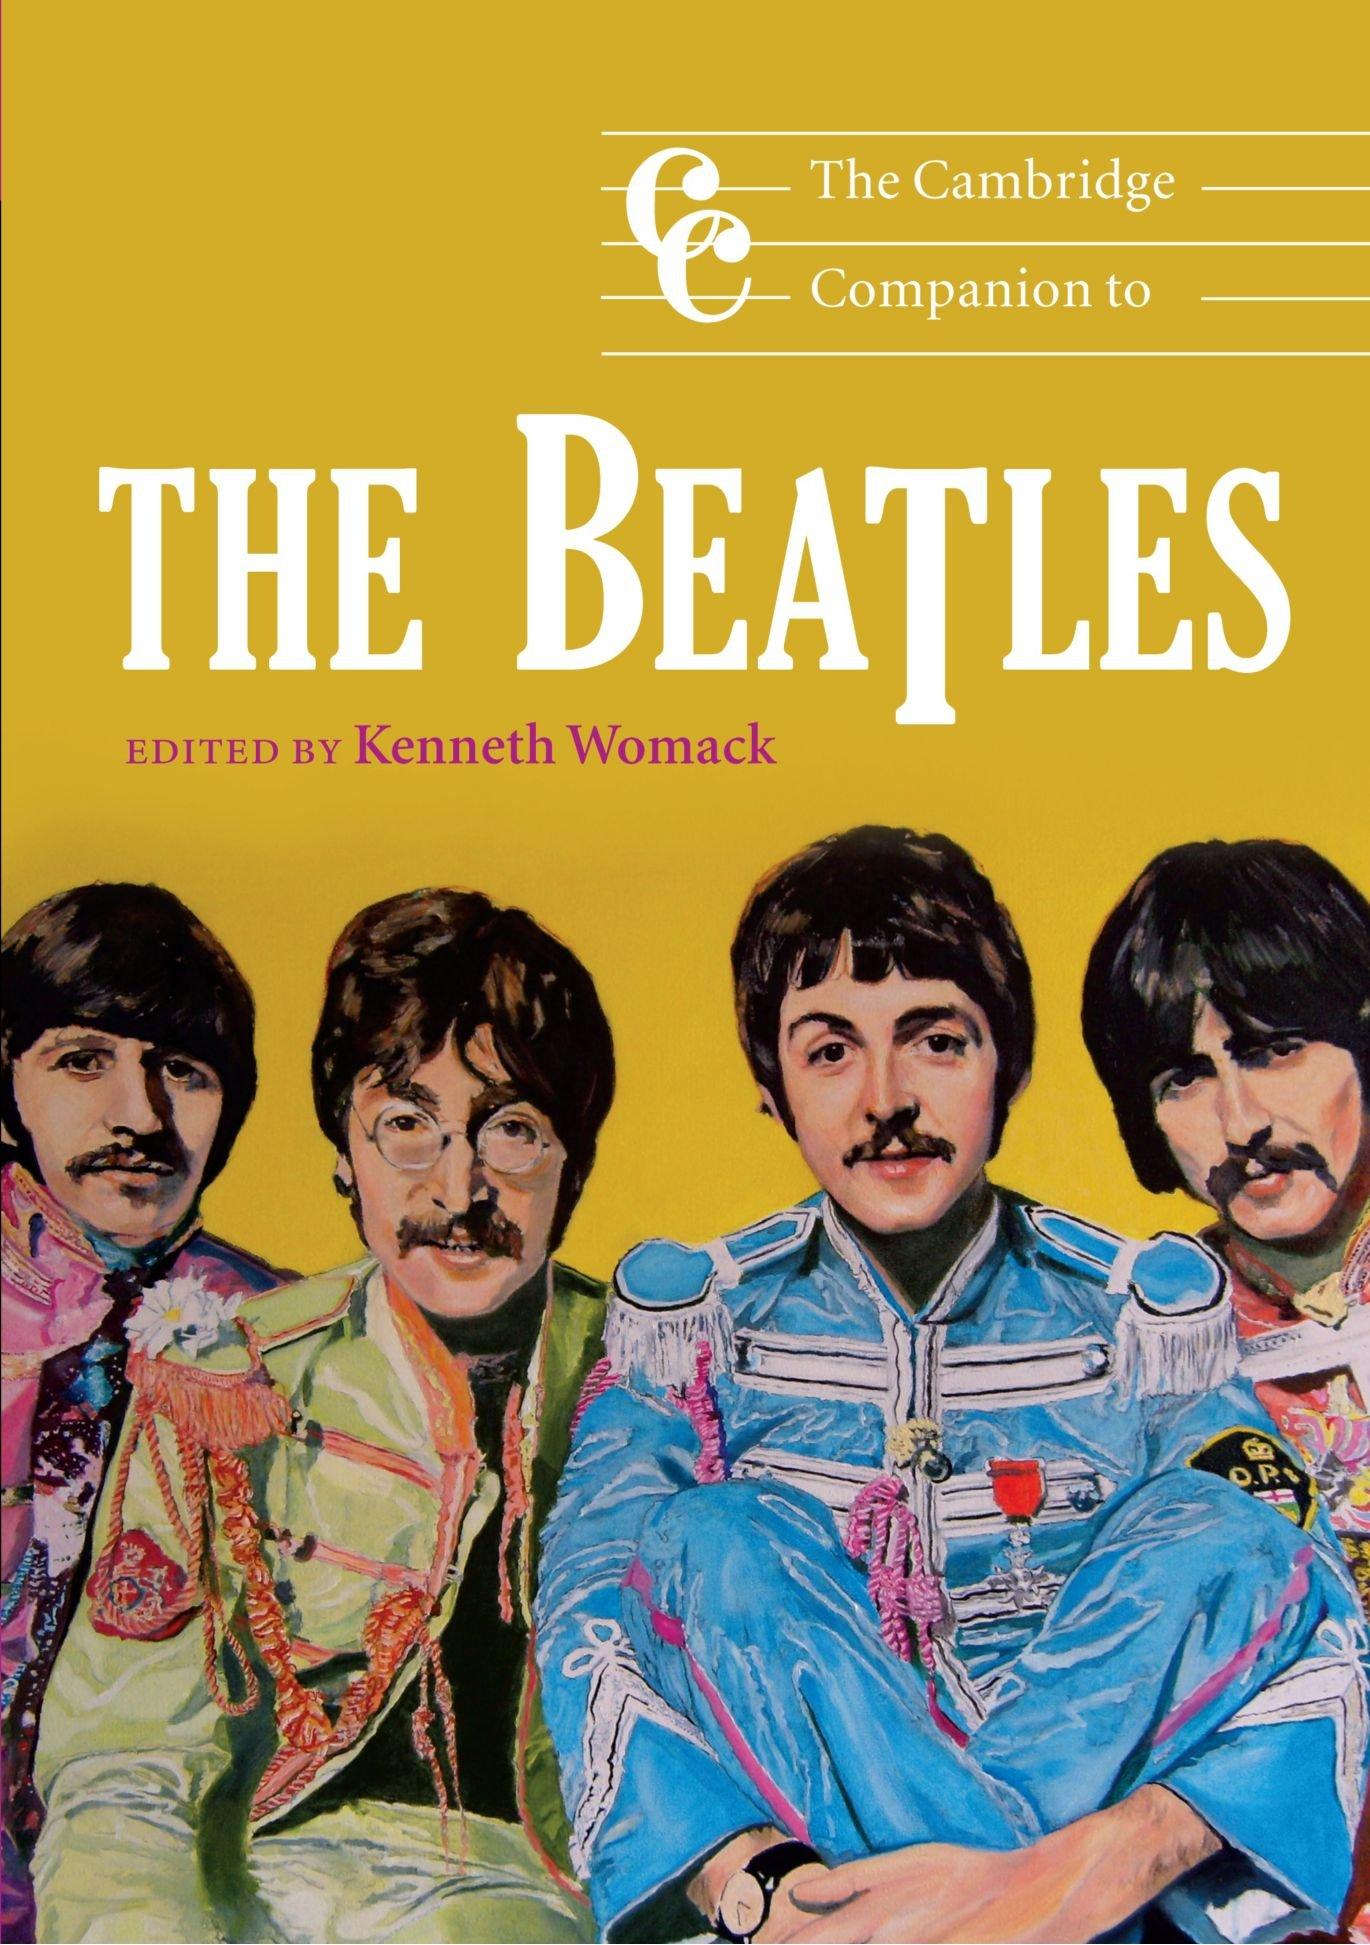 The Cambridge Companion to the Beatles (Cambridge Companions to Music) PDF